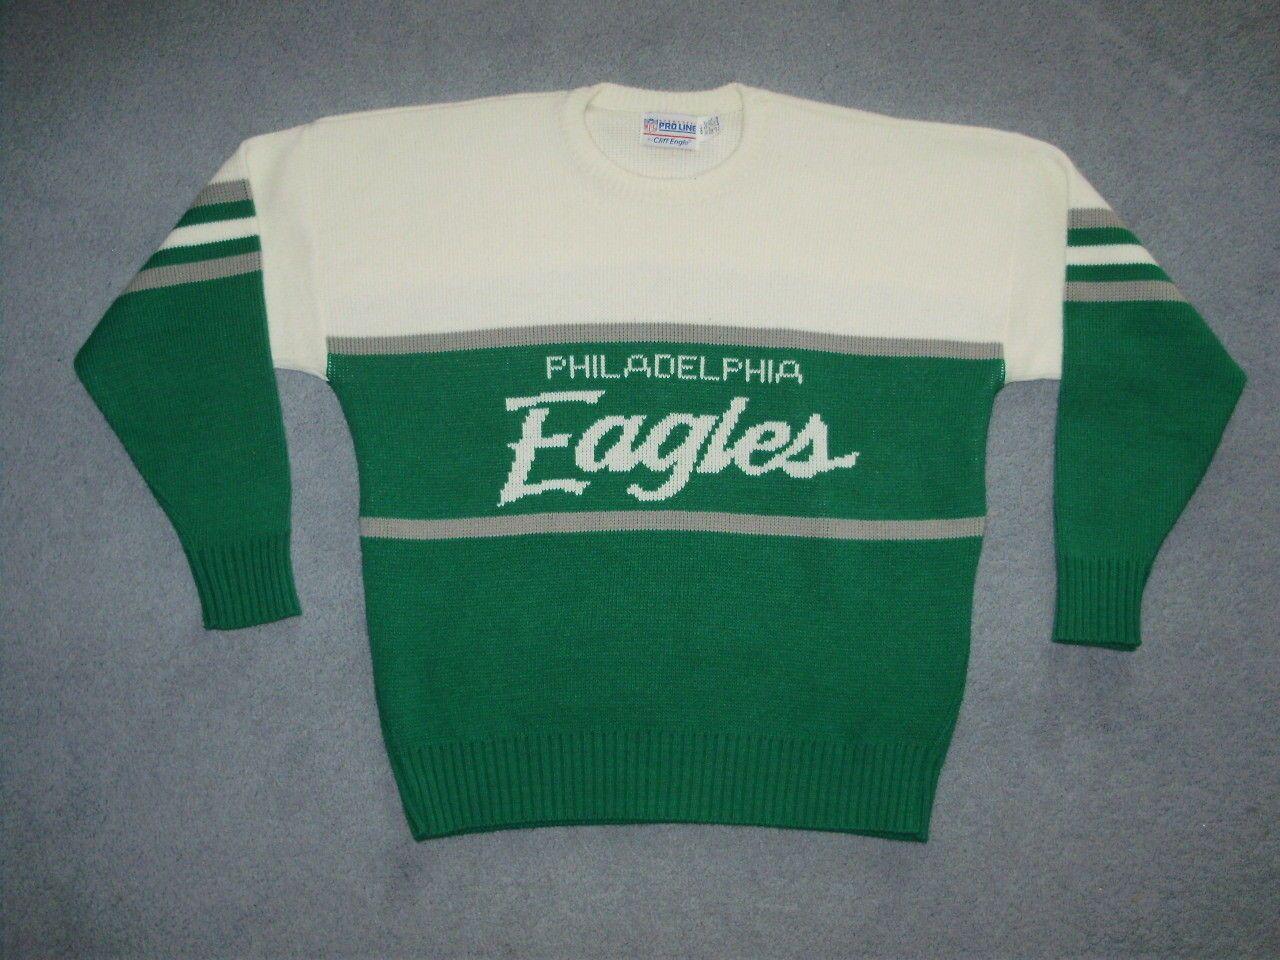 Vintage Philadelphia Eagles Cliff Engle Sweater Starter Nike Mccoy Foles Nfl Ebay Philadelphia Eagles Sweaters Eagle Shirts [ 960 x 1280 Pixel ]